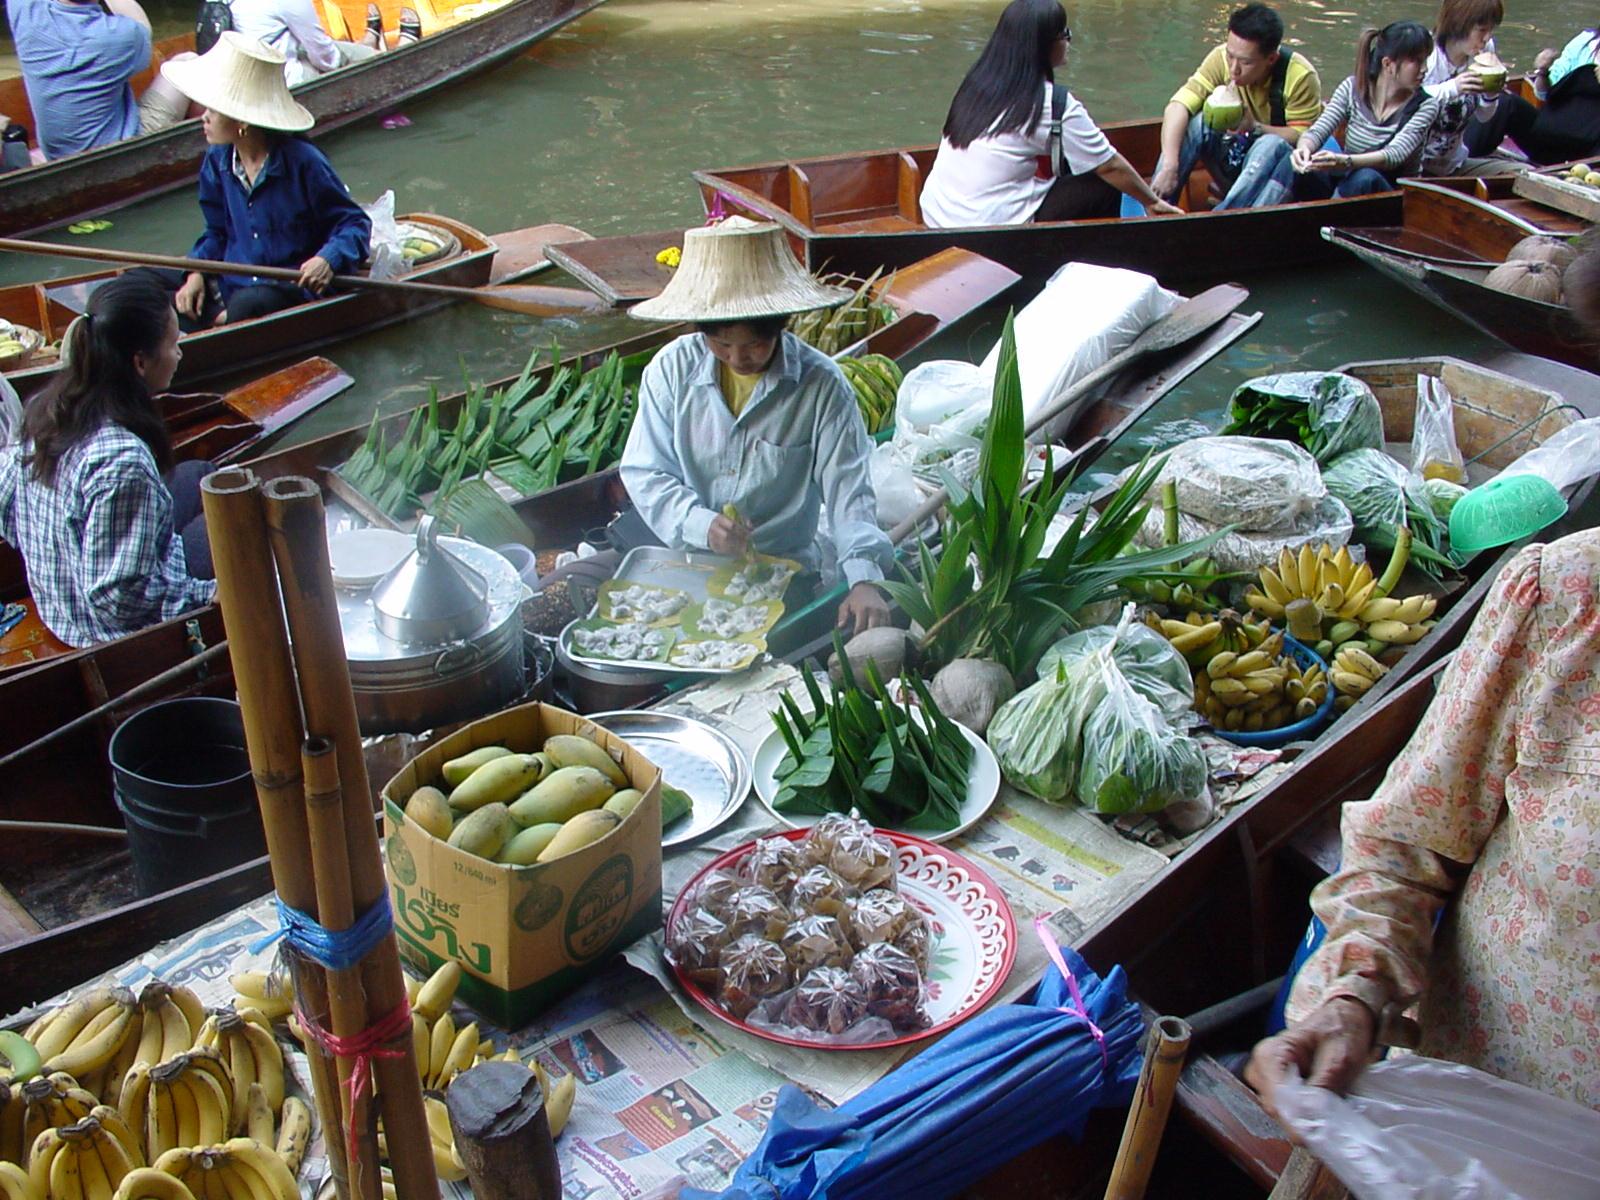 thailand-februar-2004-087.jpg